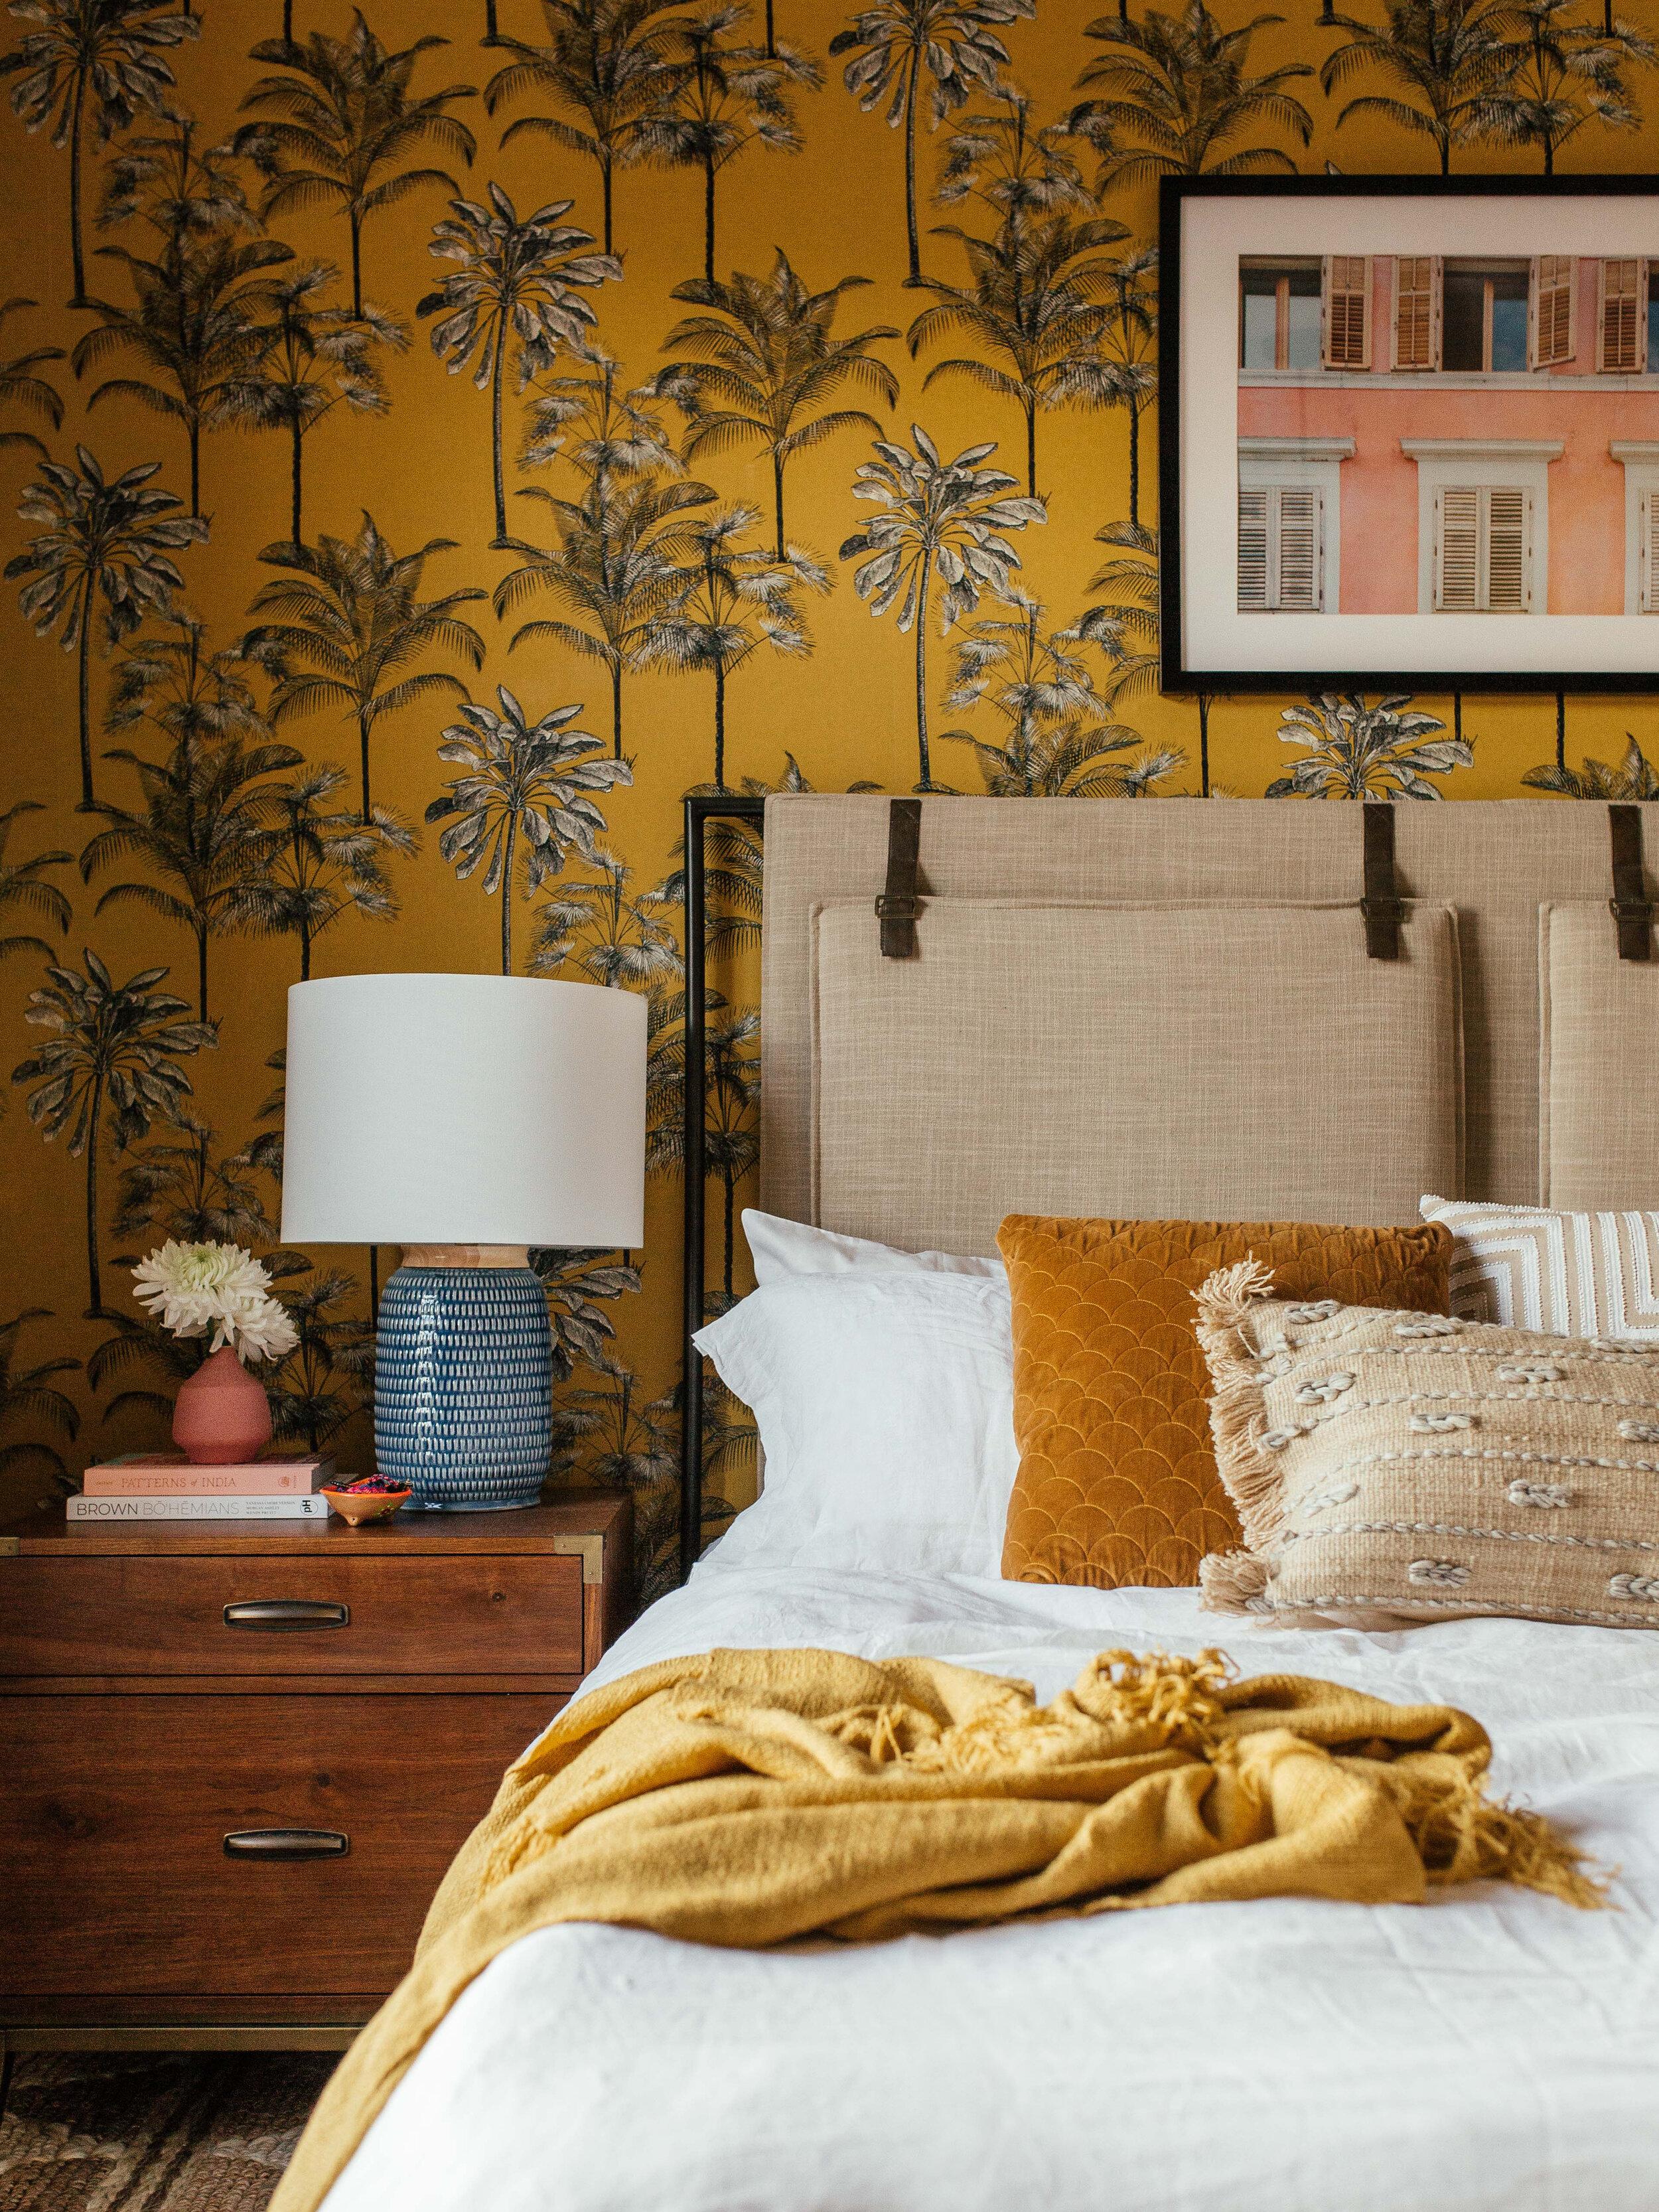 Rana Furniture Bedroom Sets : furniture, bedroom, Sophia, Rana's, Makeover, Bedroom, BRAND